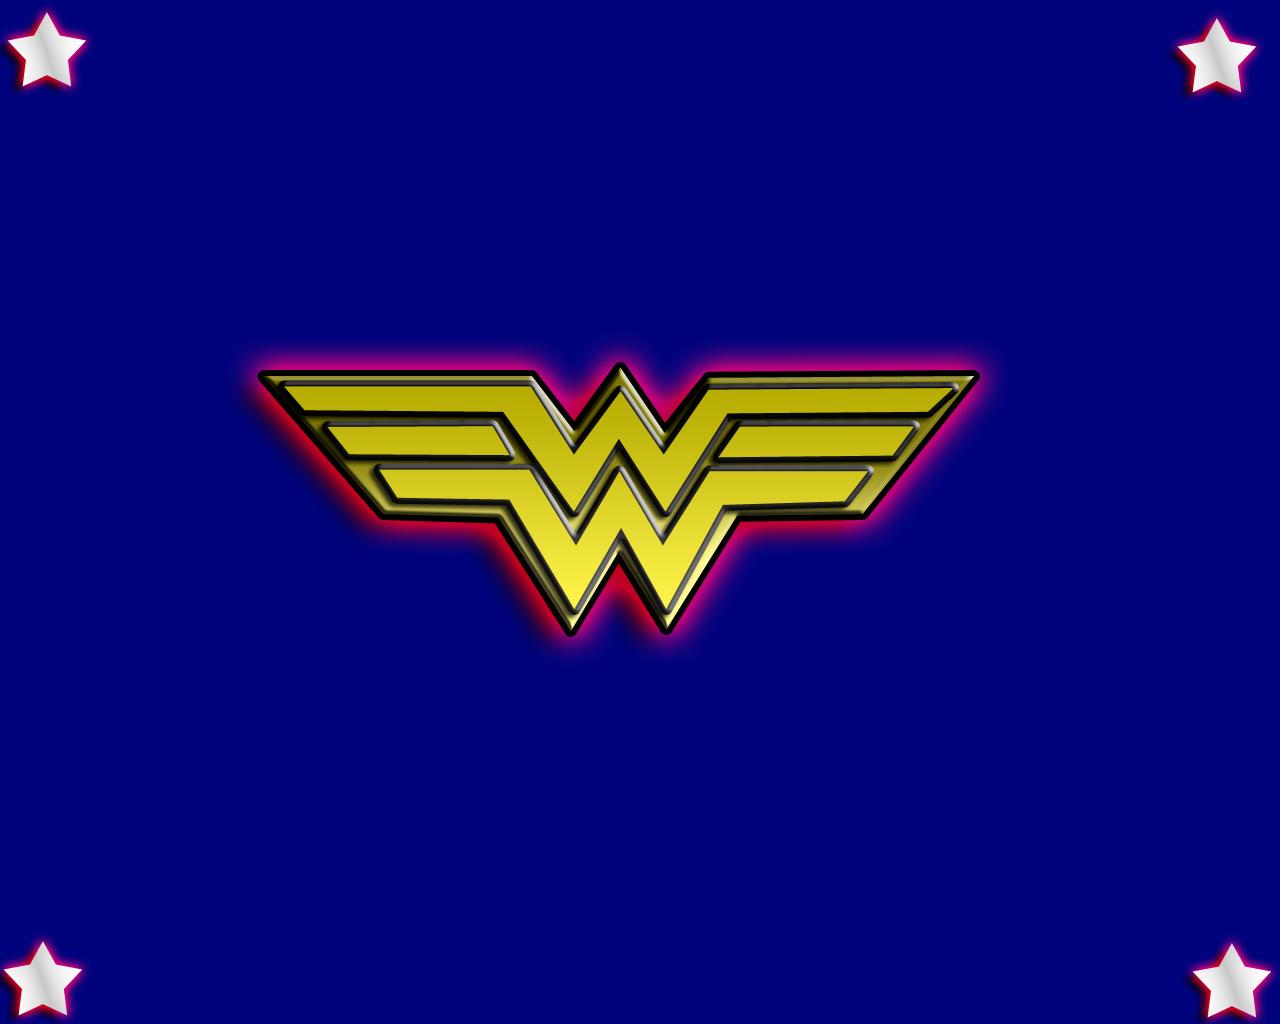 wonder woman logo wallpaper   Comic Imagescom 1280x1024